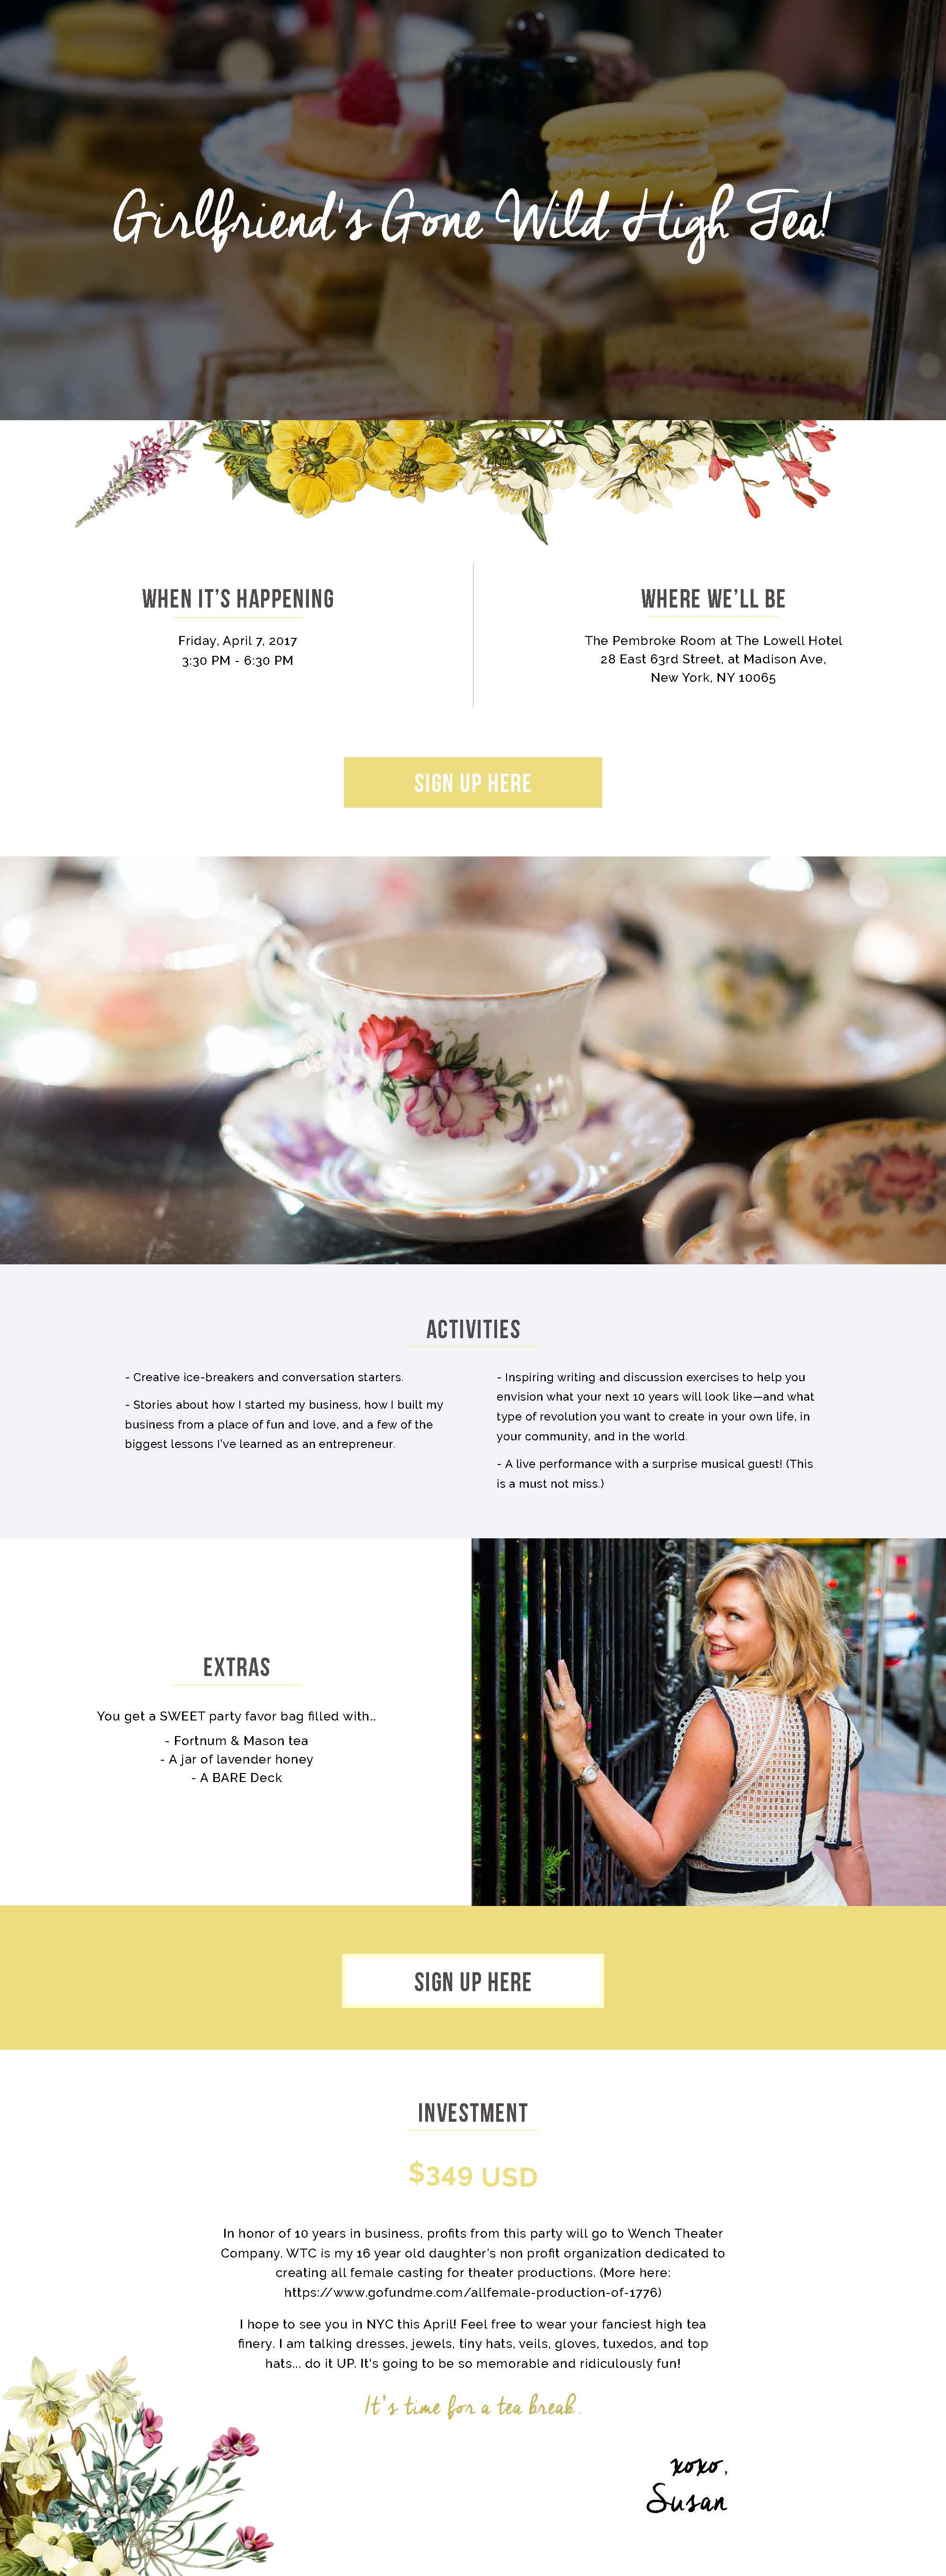 SH_NY_teatimewebpage_v2